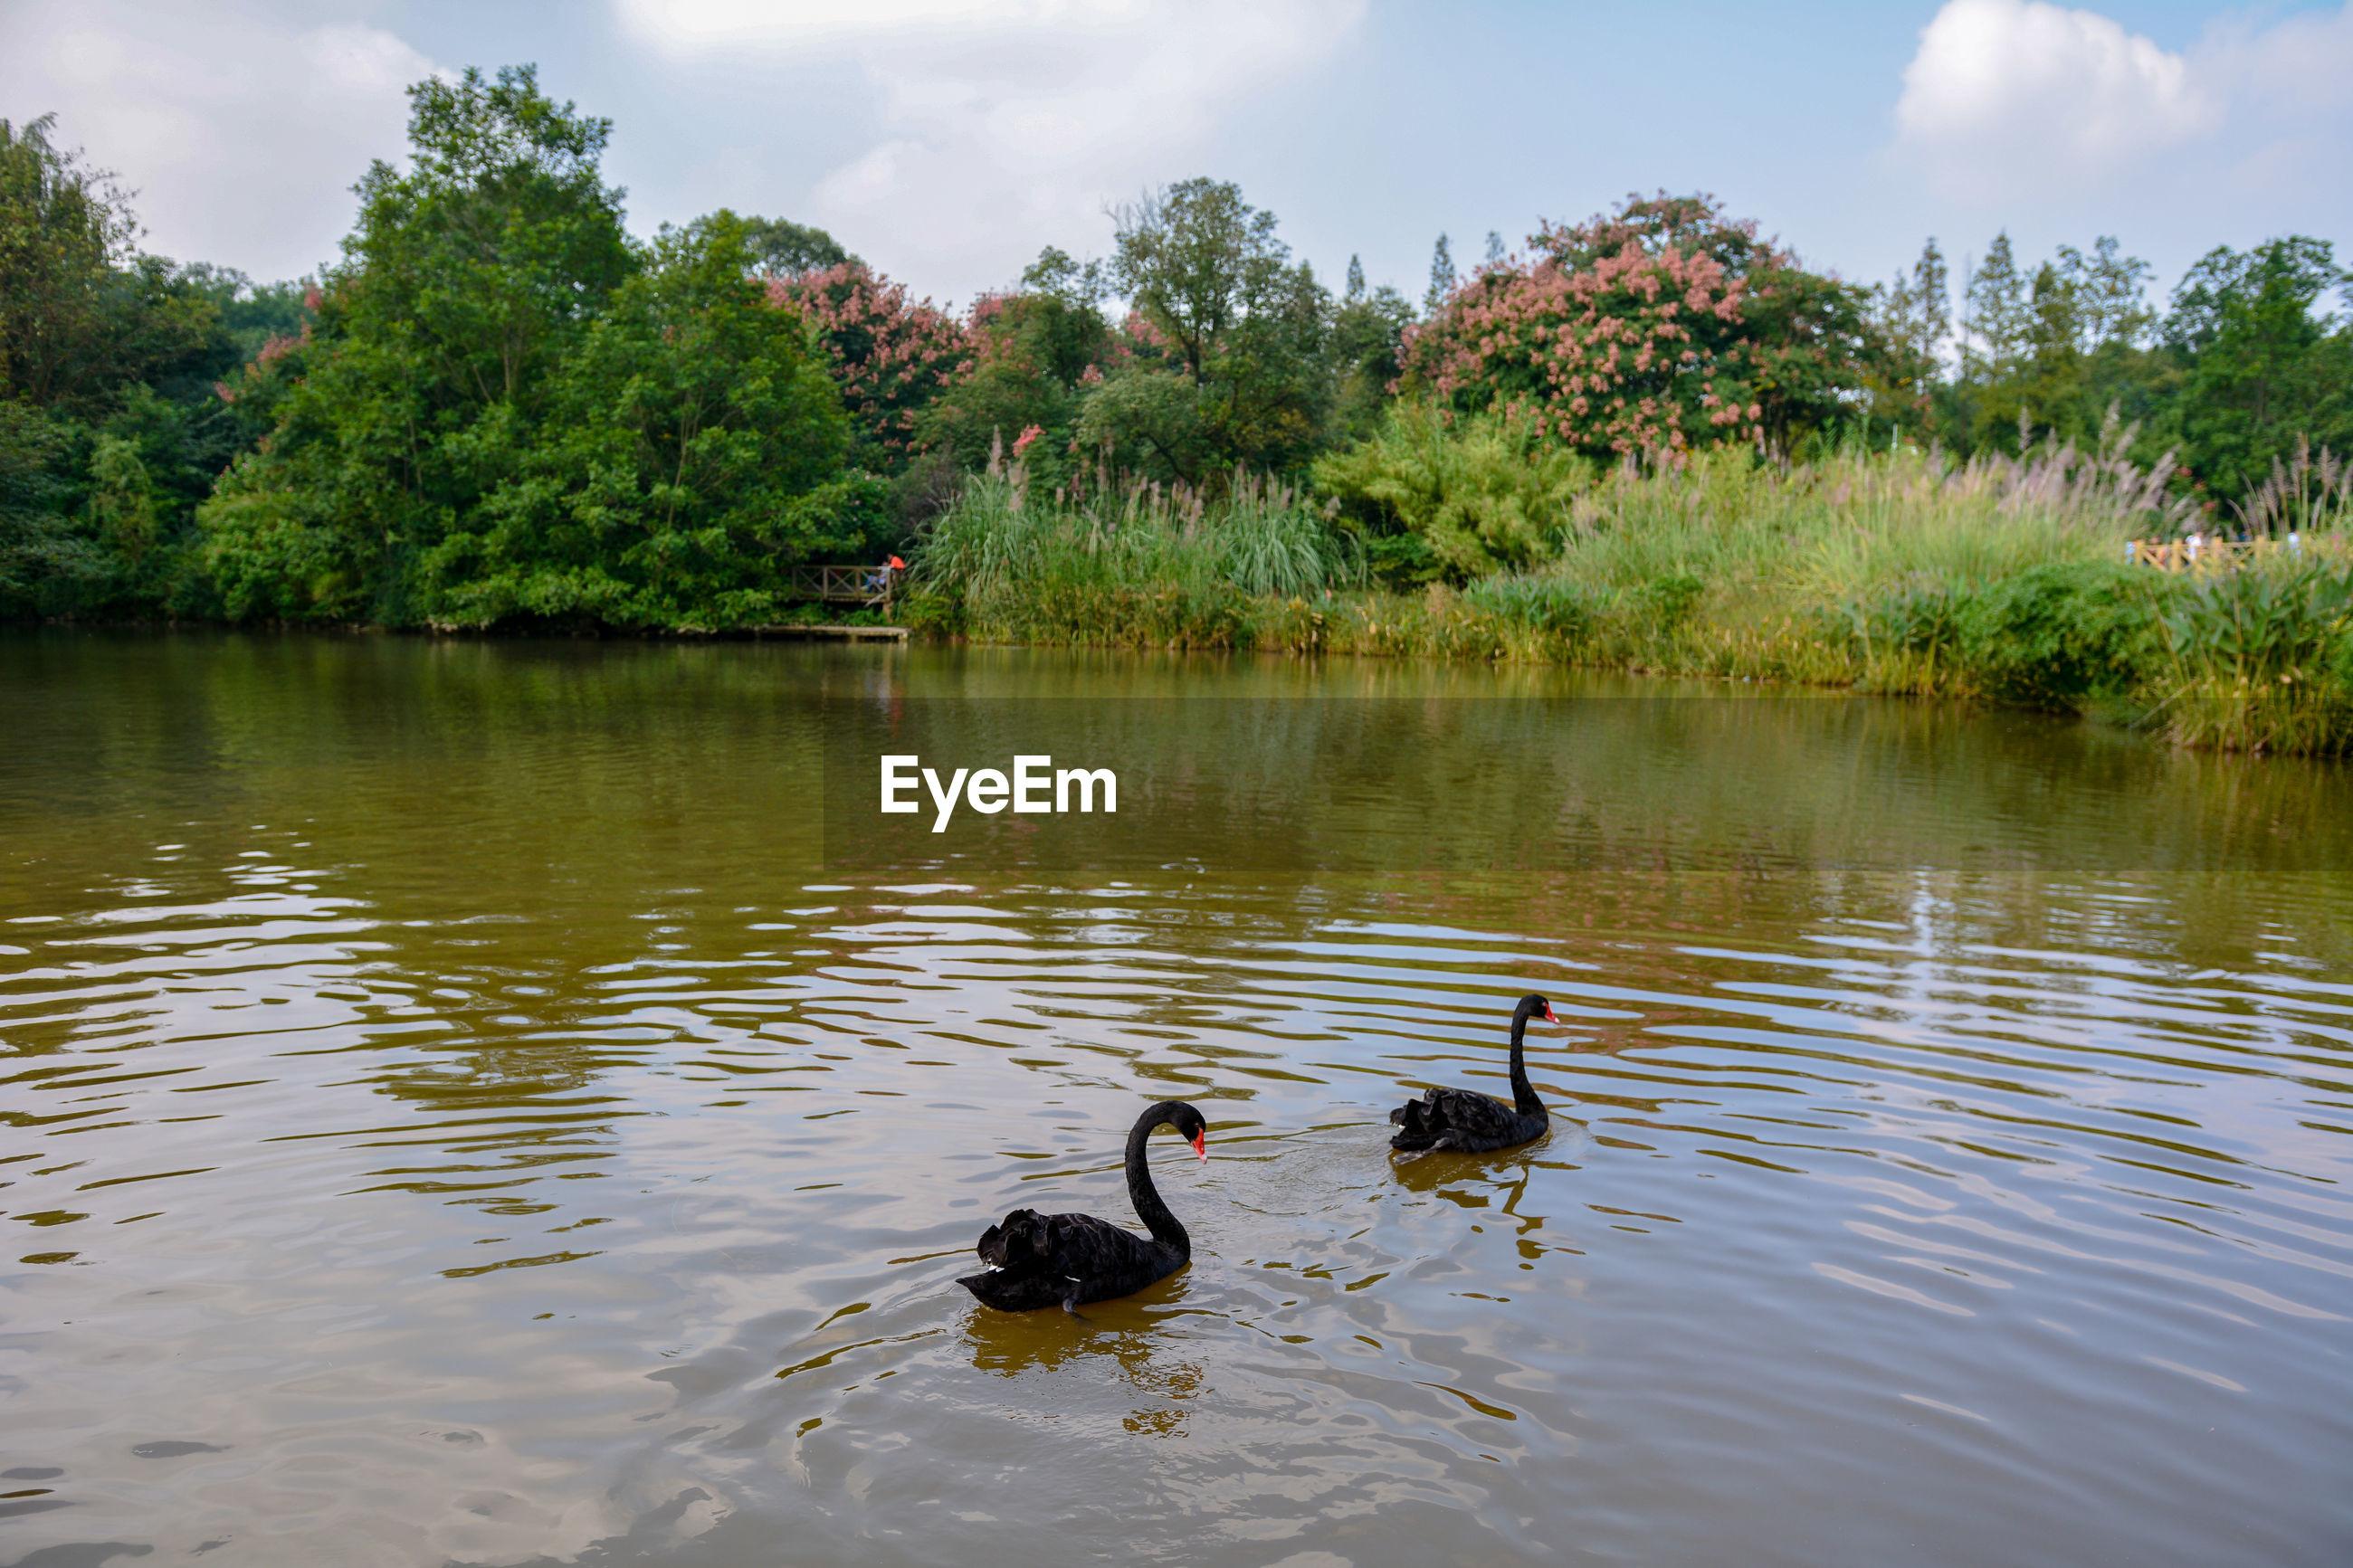 Black swans swimming in lake against trees